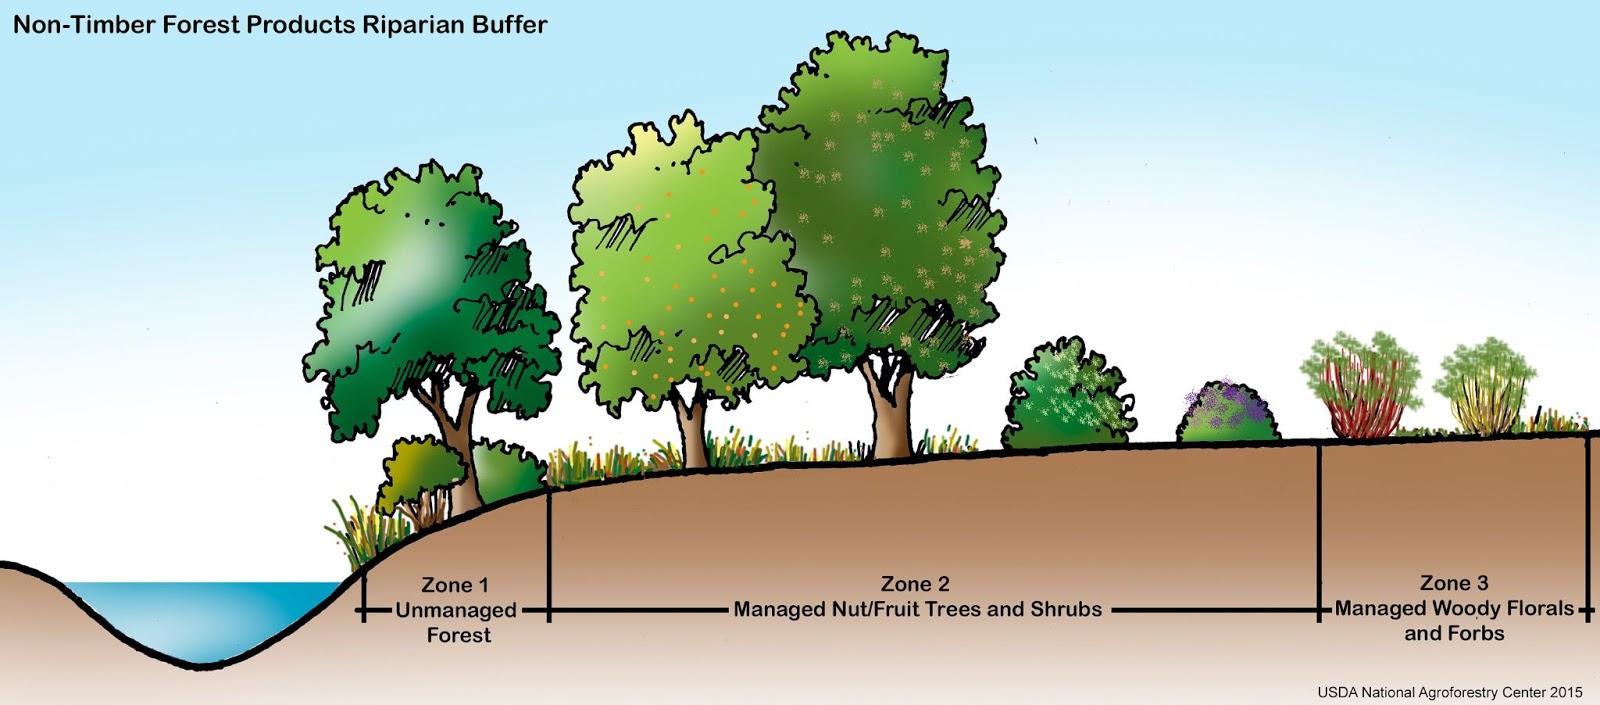 Riparian Buffer, Agroforestry